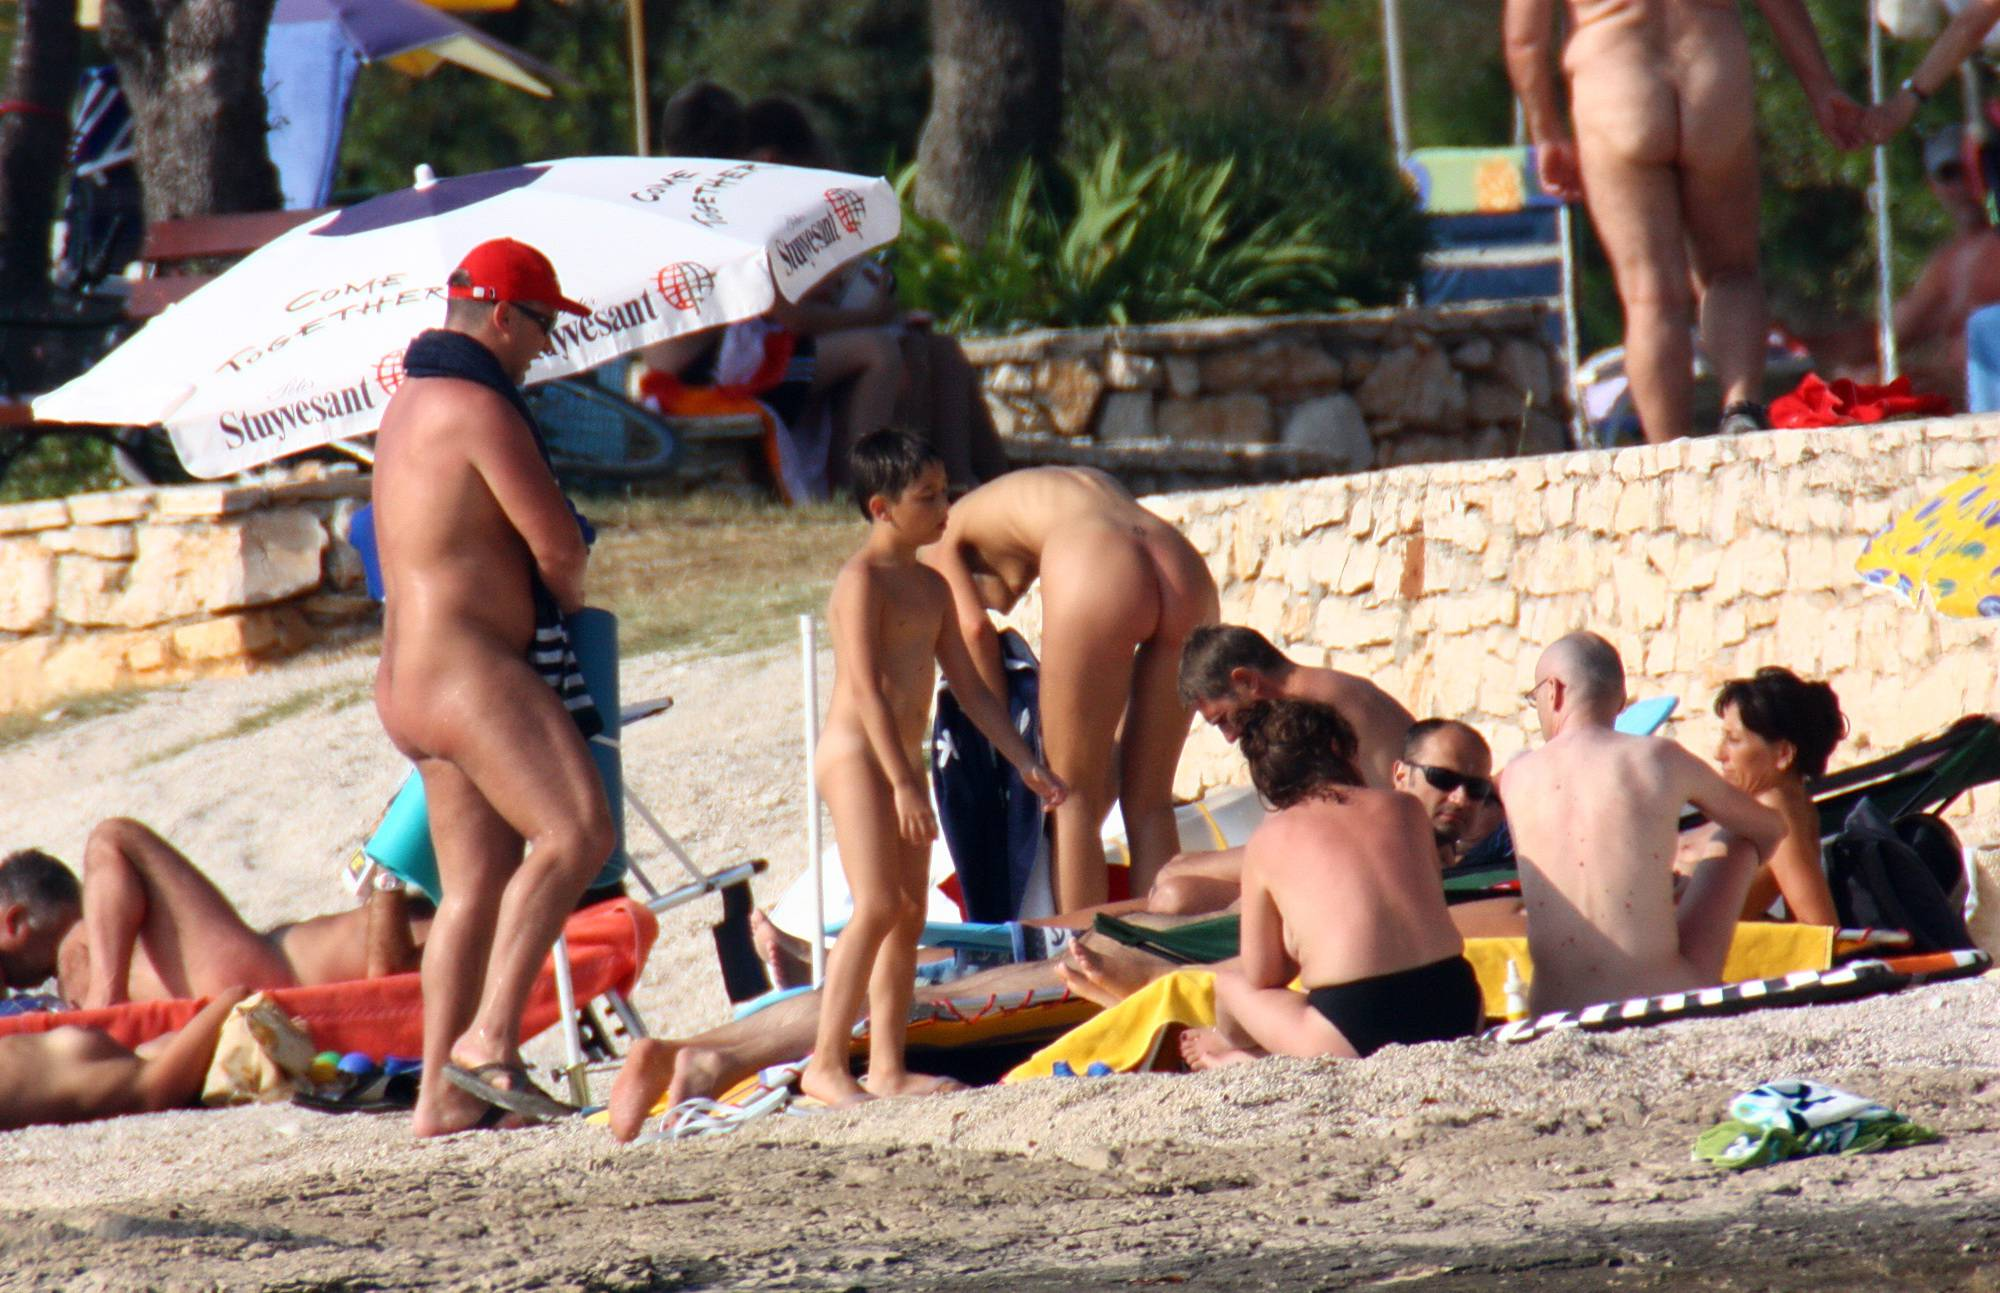 Nudist Photos Sandy Lake Relaxation - 2